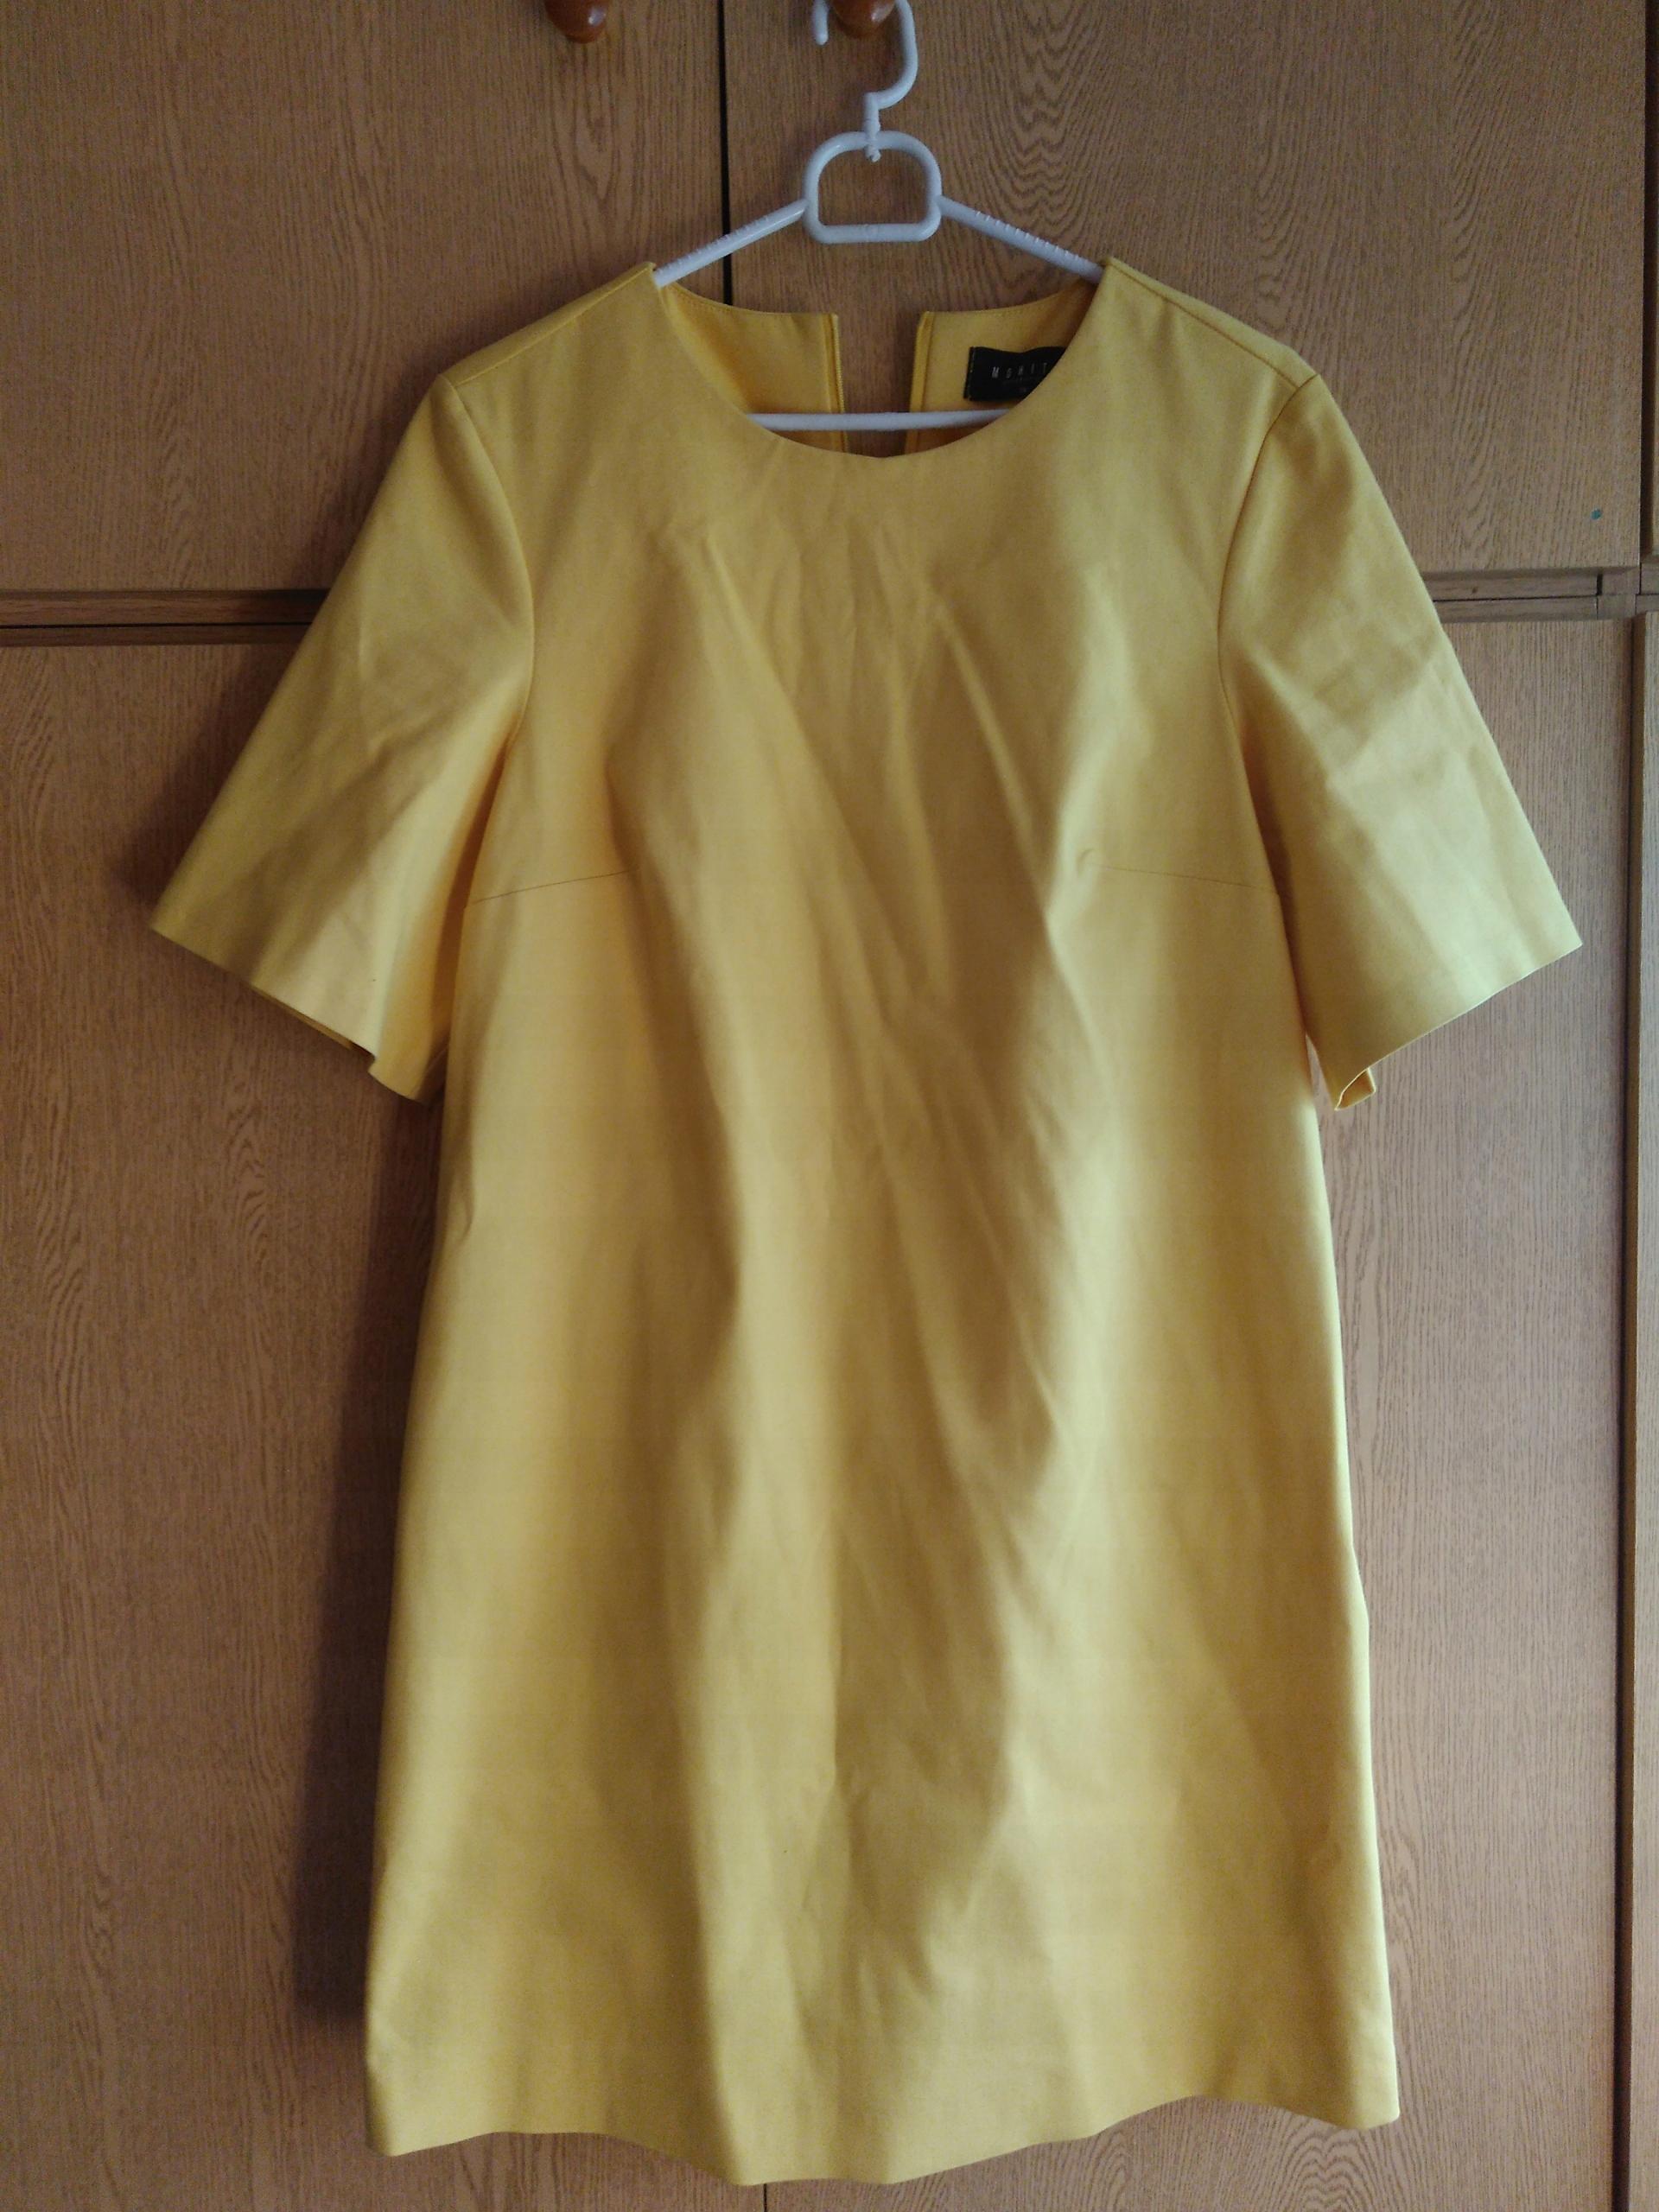 f904892ea2 Sukienka Mohito rozmiar 38 żółta ko - 7570990748 - oficjalne ...